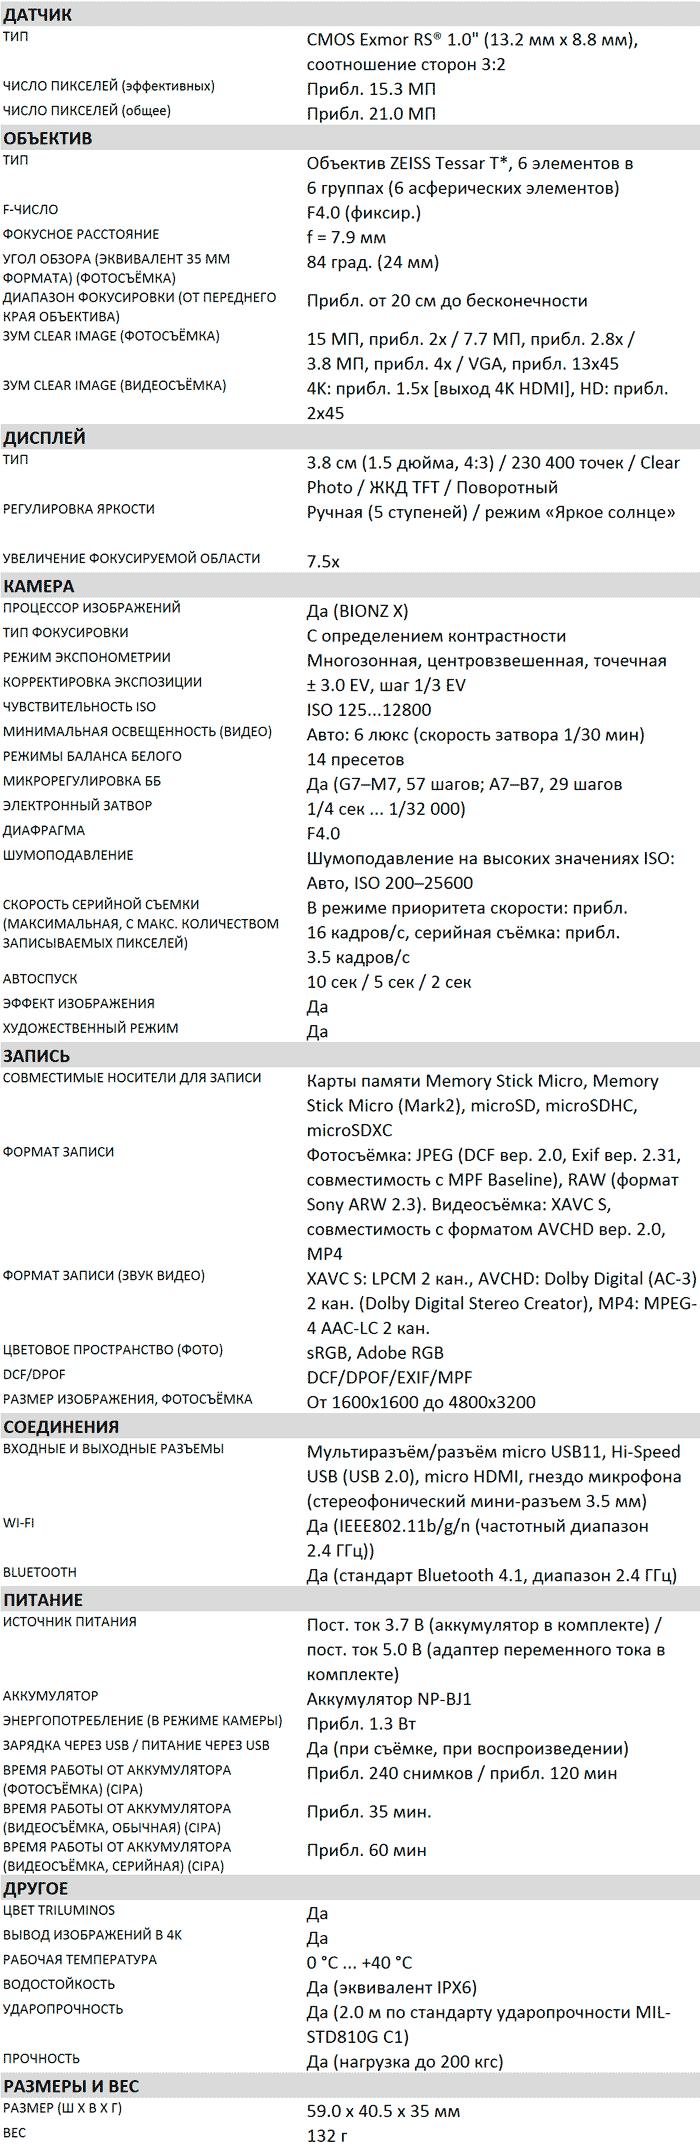 Характеристики RX0 II